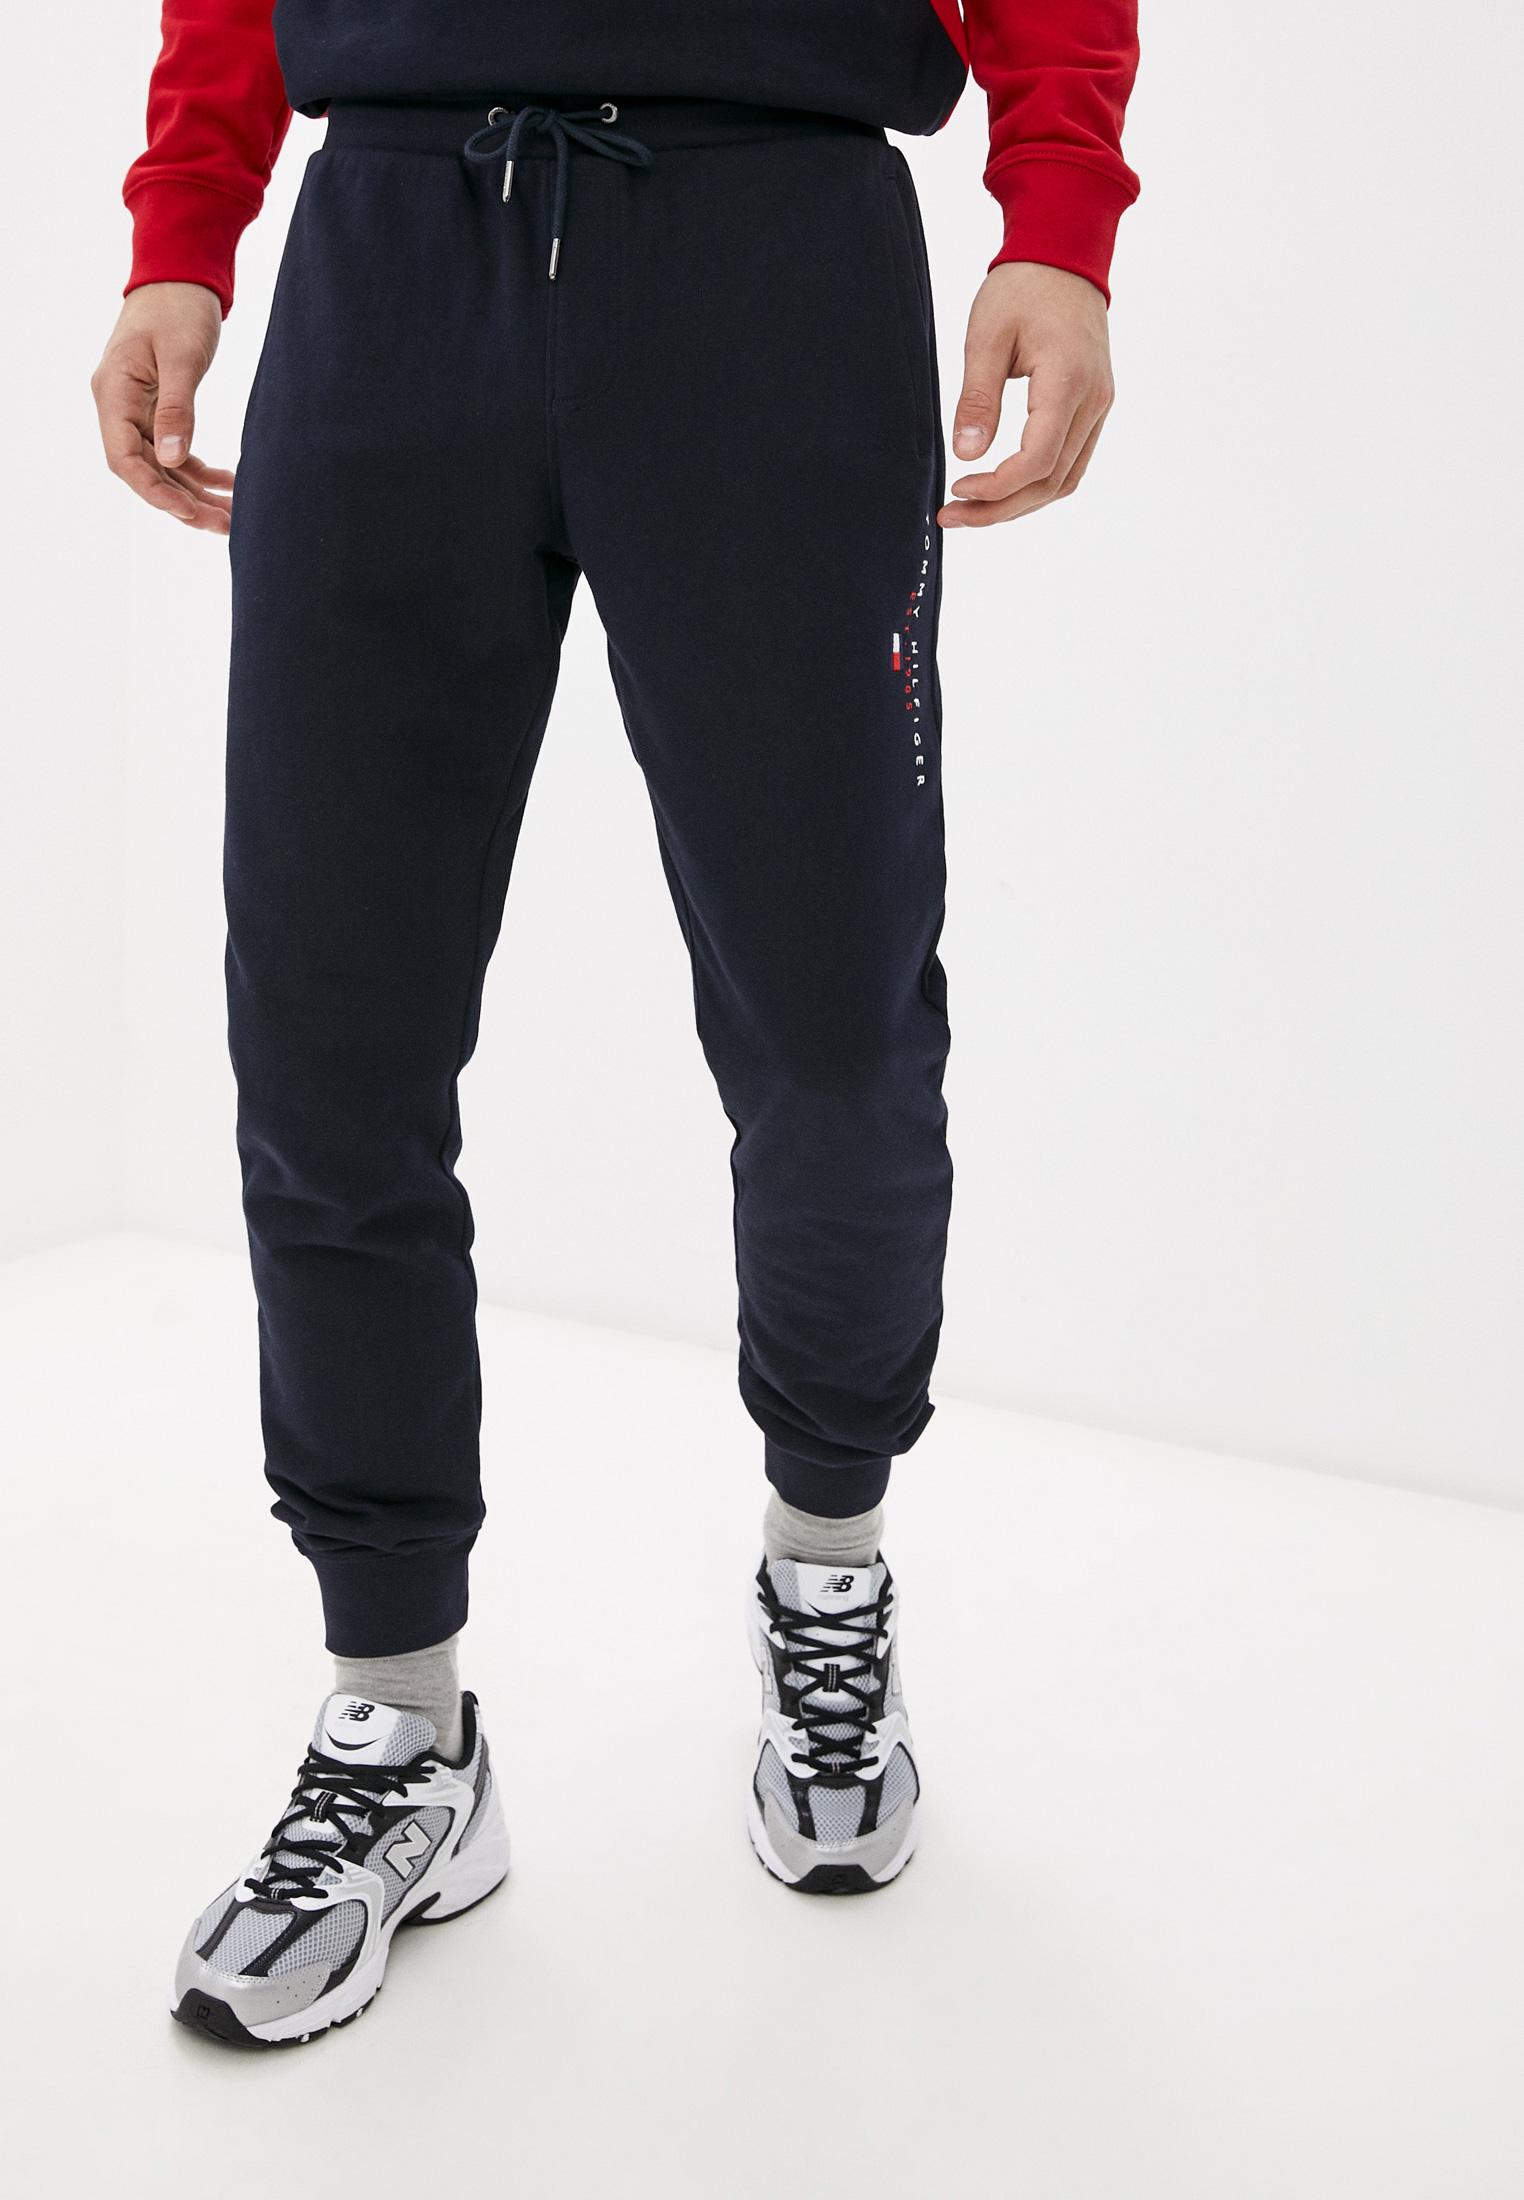 Мужские спортивные брюки Tommy Hilfiger (Томми Хилфигер) MW0MW17384